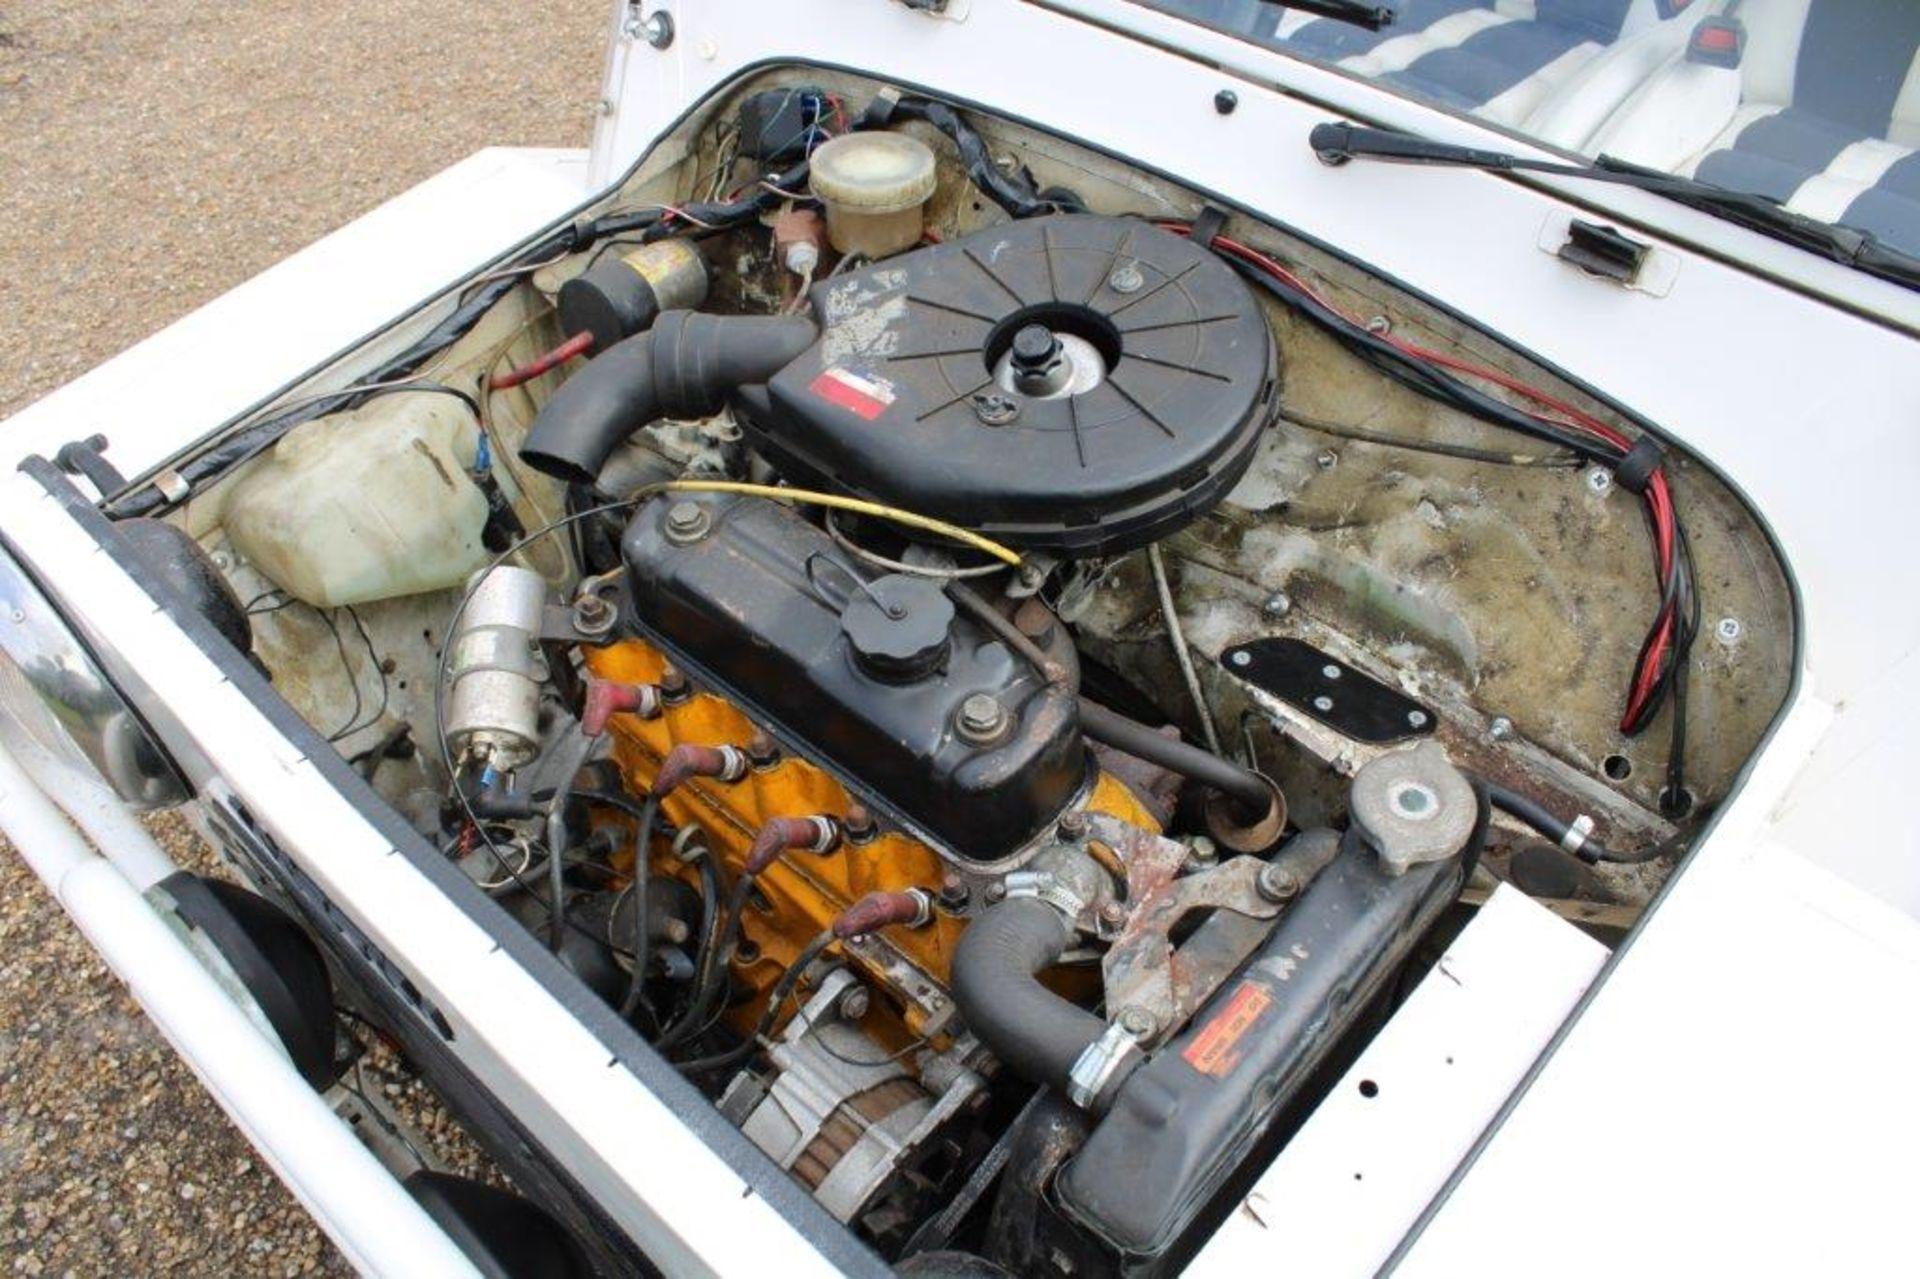 1988 Austin Rover Mini Moke - Image 22 of 22